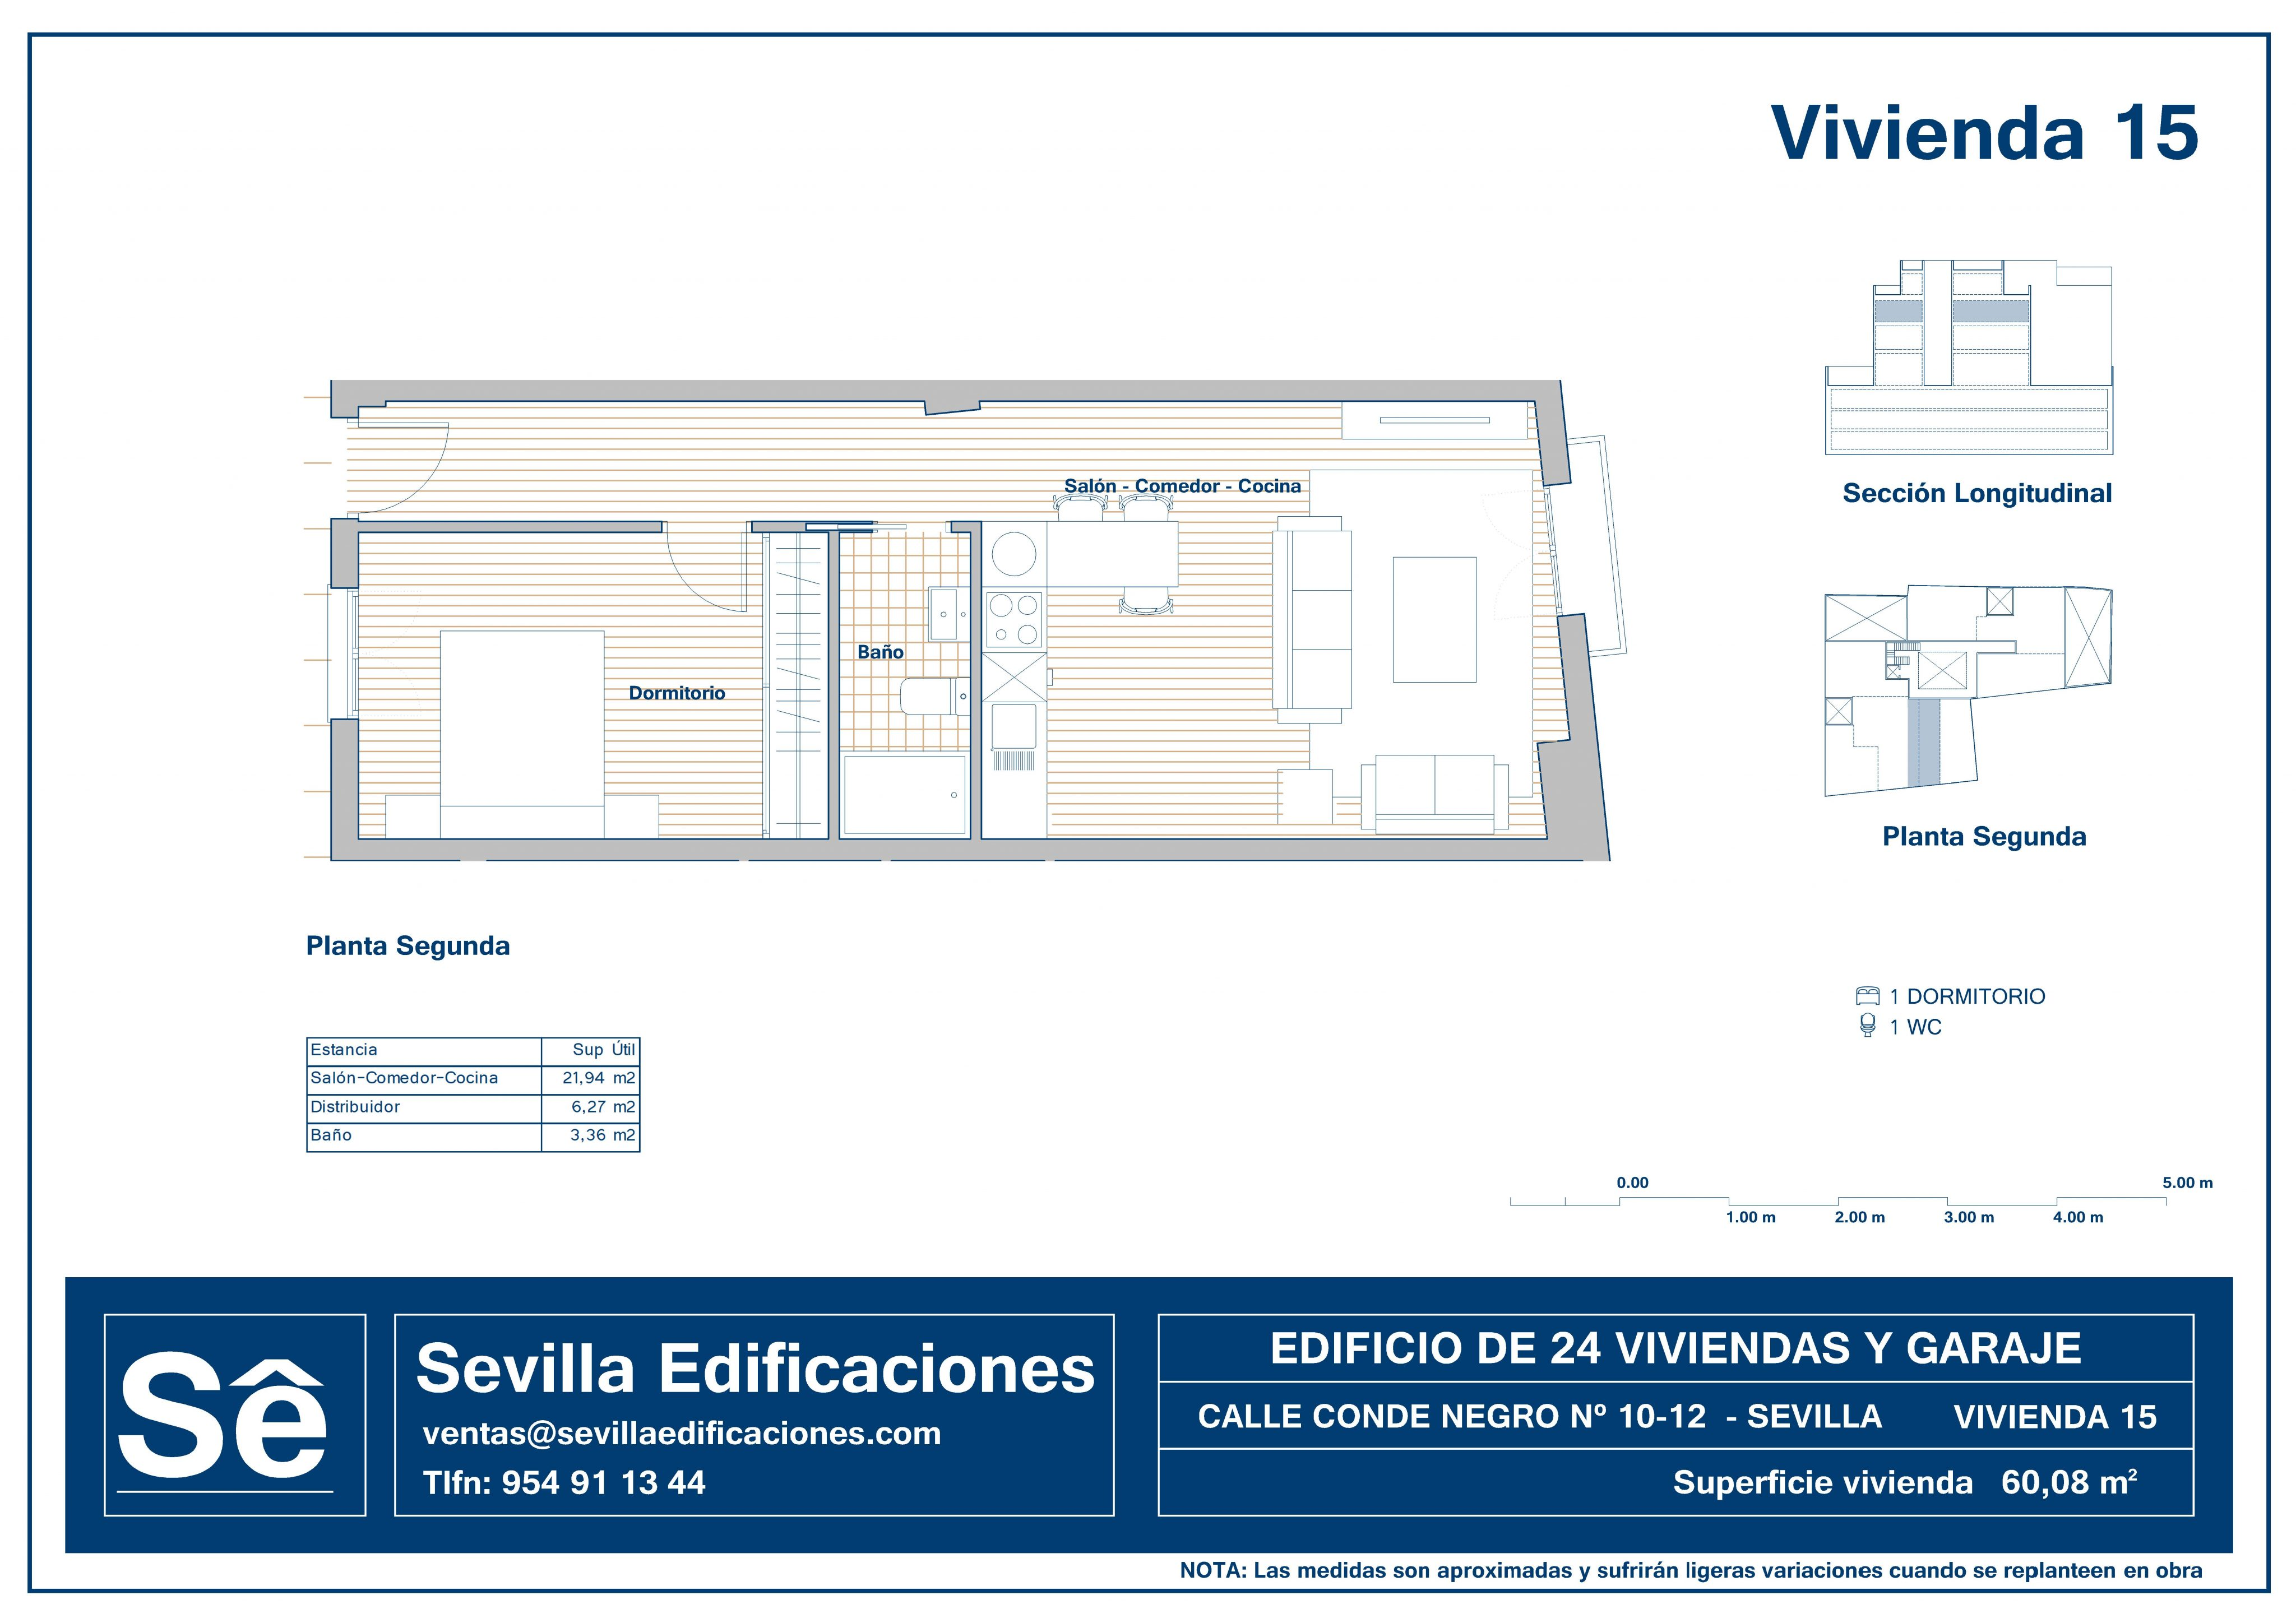 CONDENEGRO_VIVIENDA_15